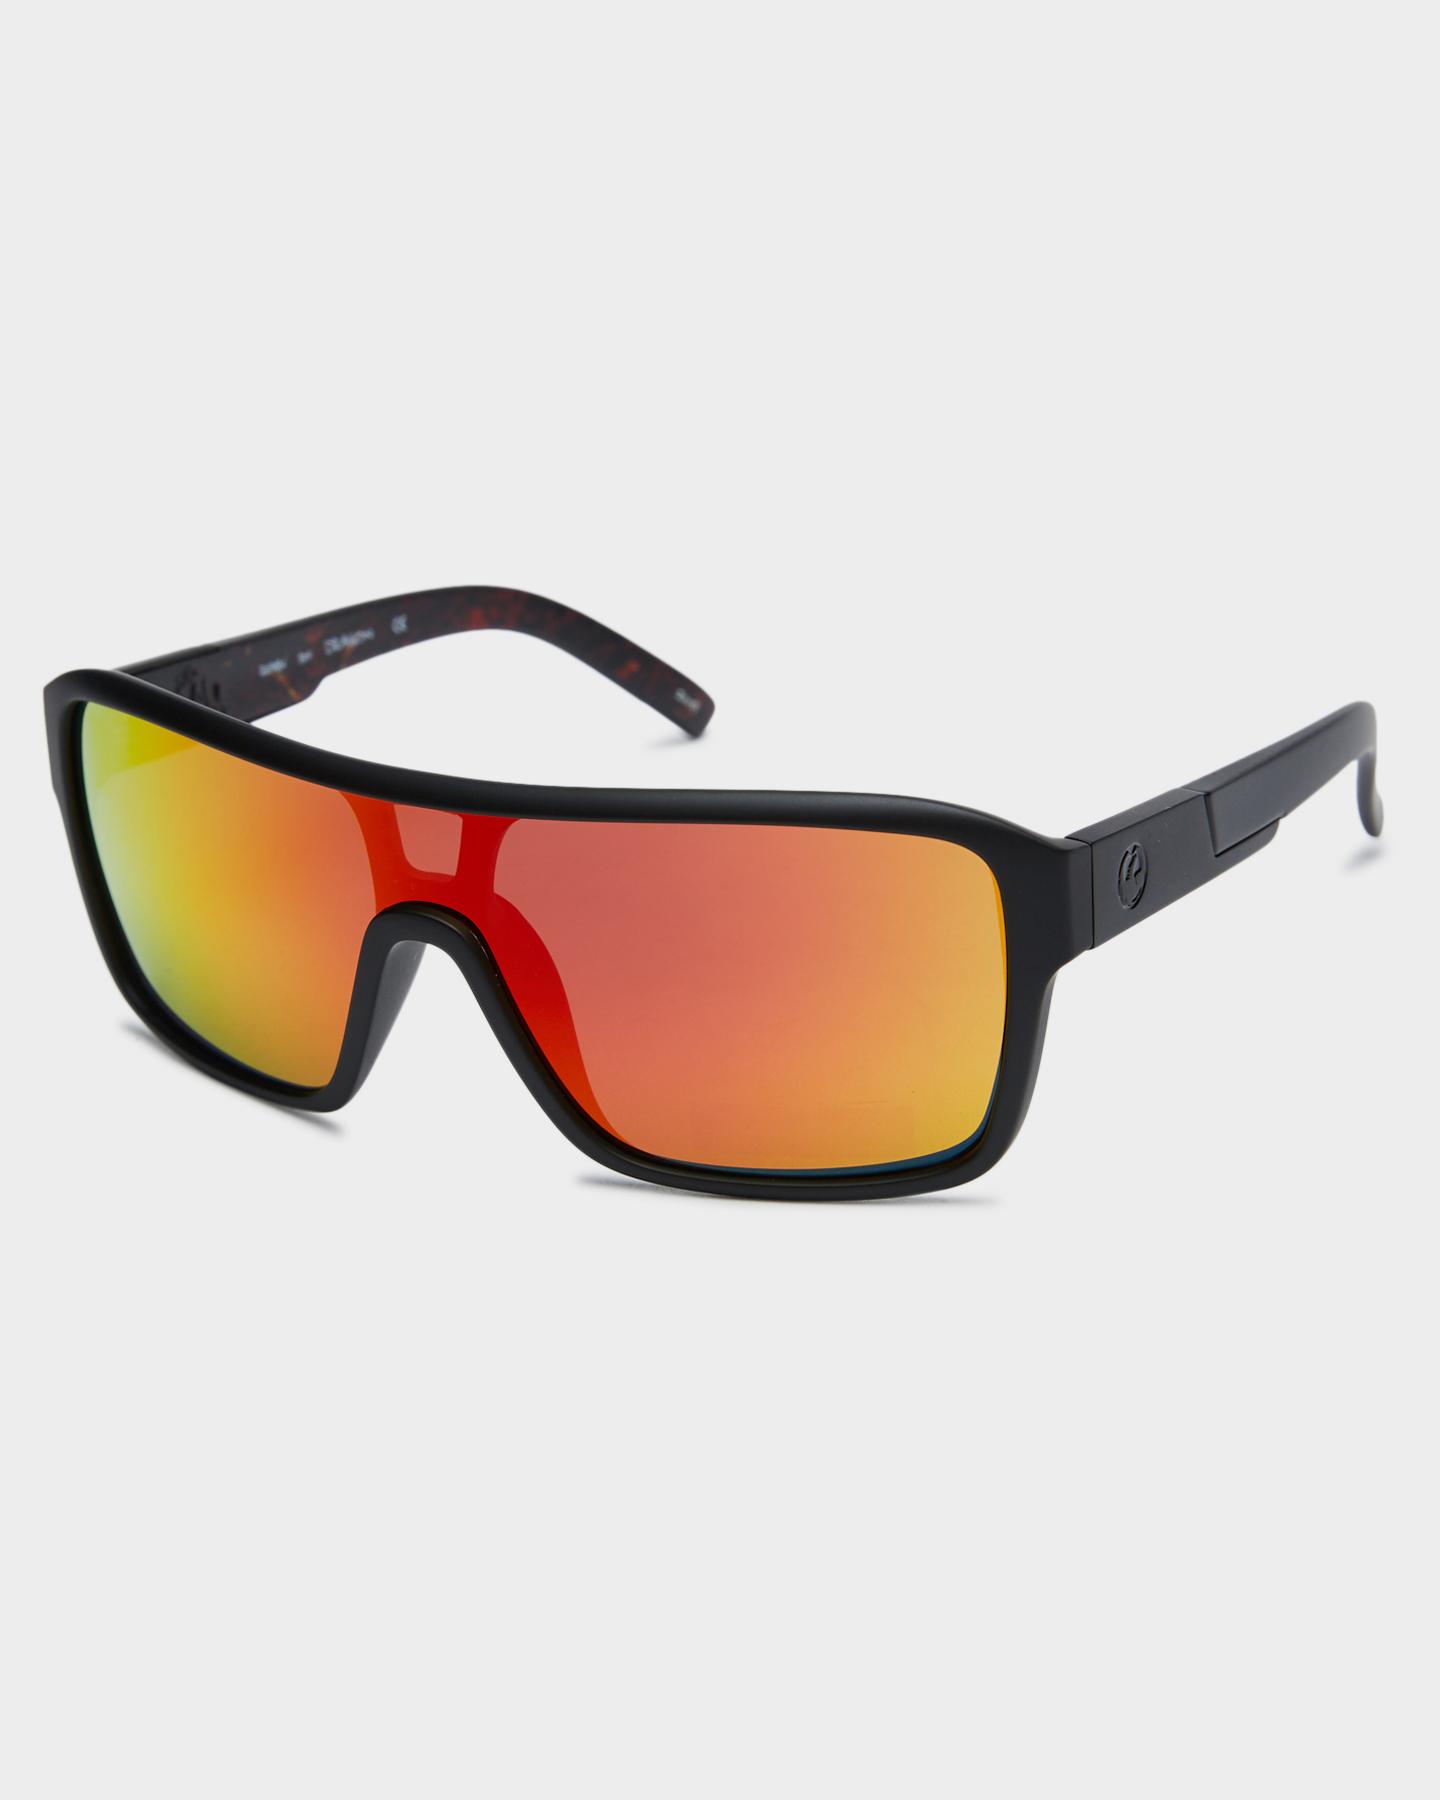 Dragon Remix Sunglasses Matte Blk Infrno Ion Matte Blk Infrno Ion